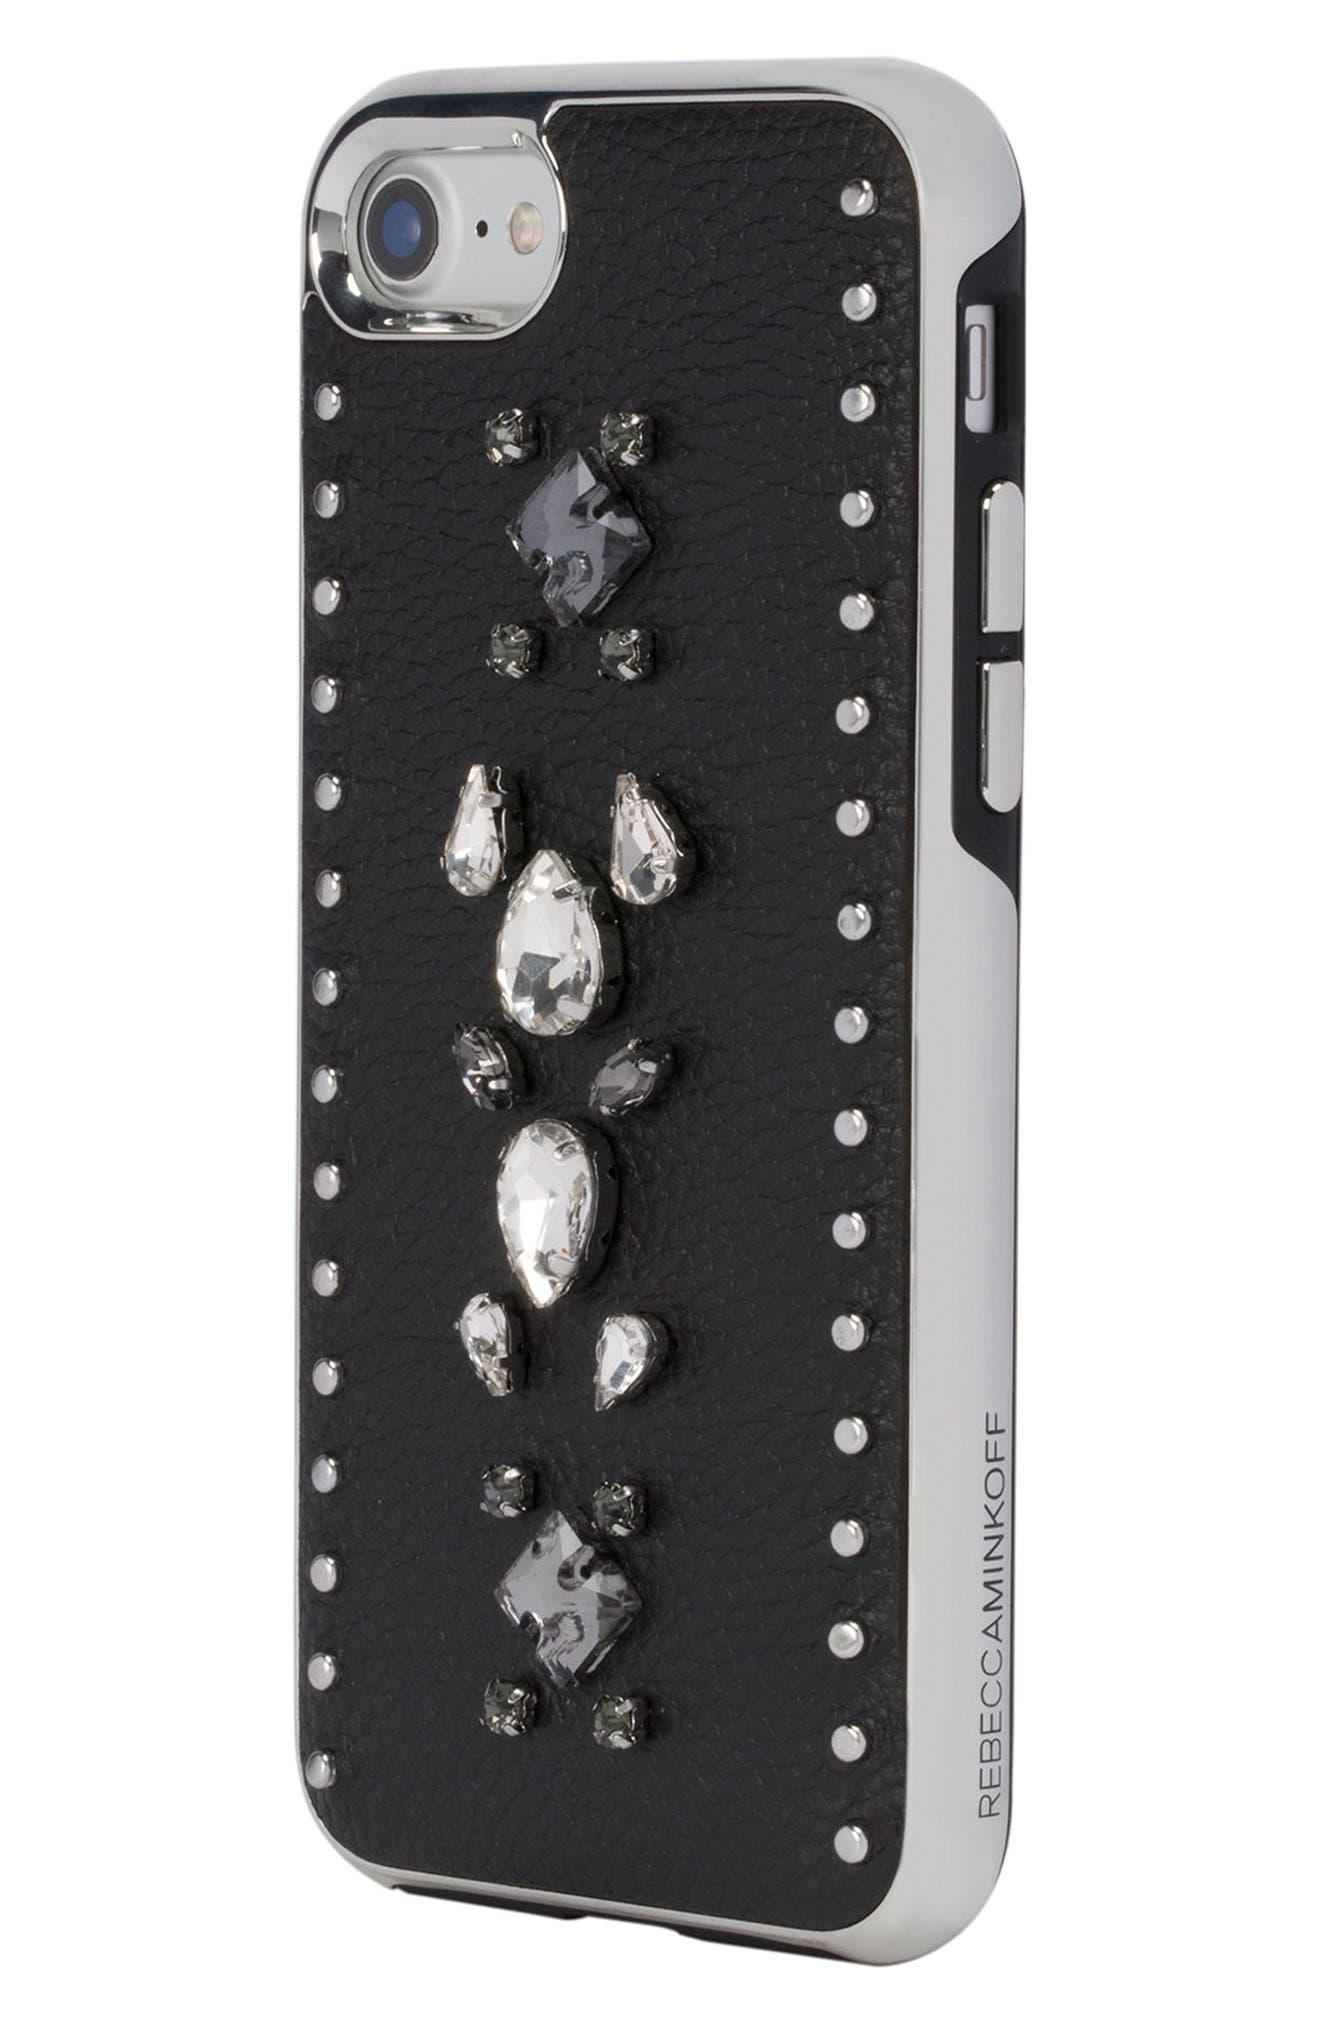 Inlay Gem Leather iPhone 7/8 Plus Case,                             Alternate thumbnail 3, color,                             Multi Gems/ Studs/ Black